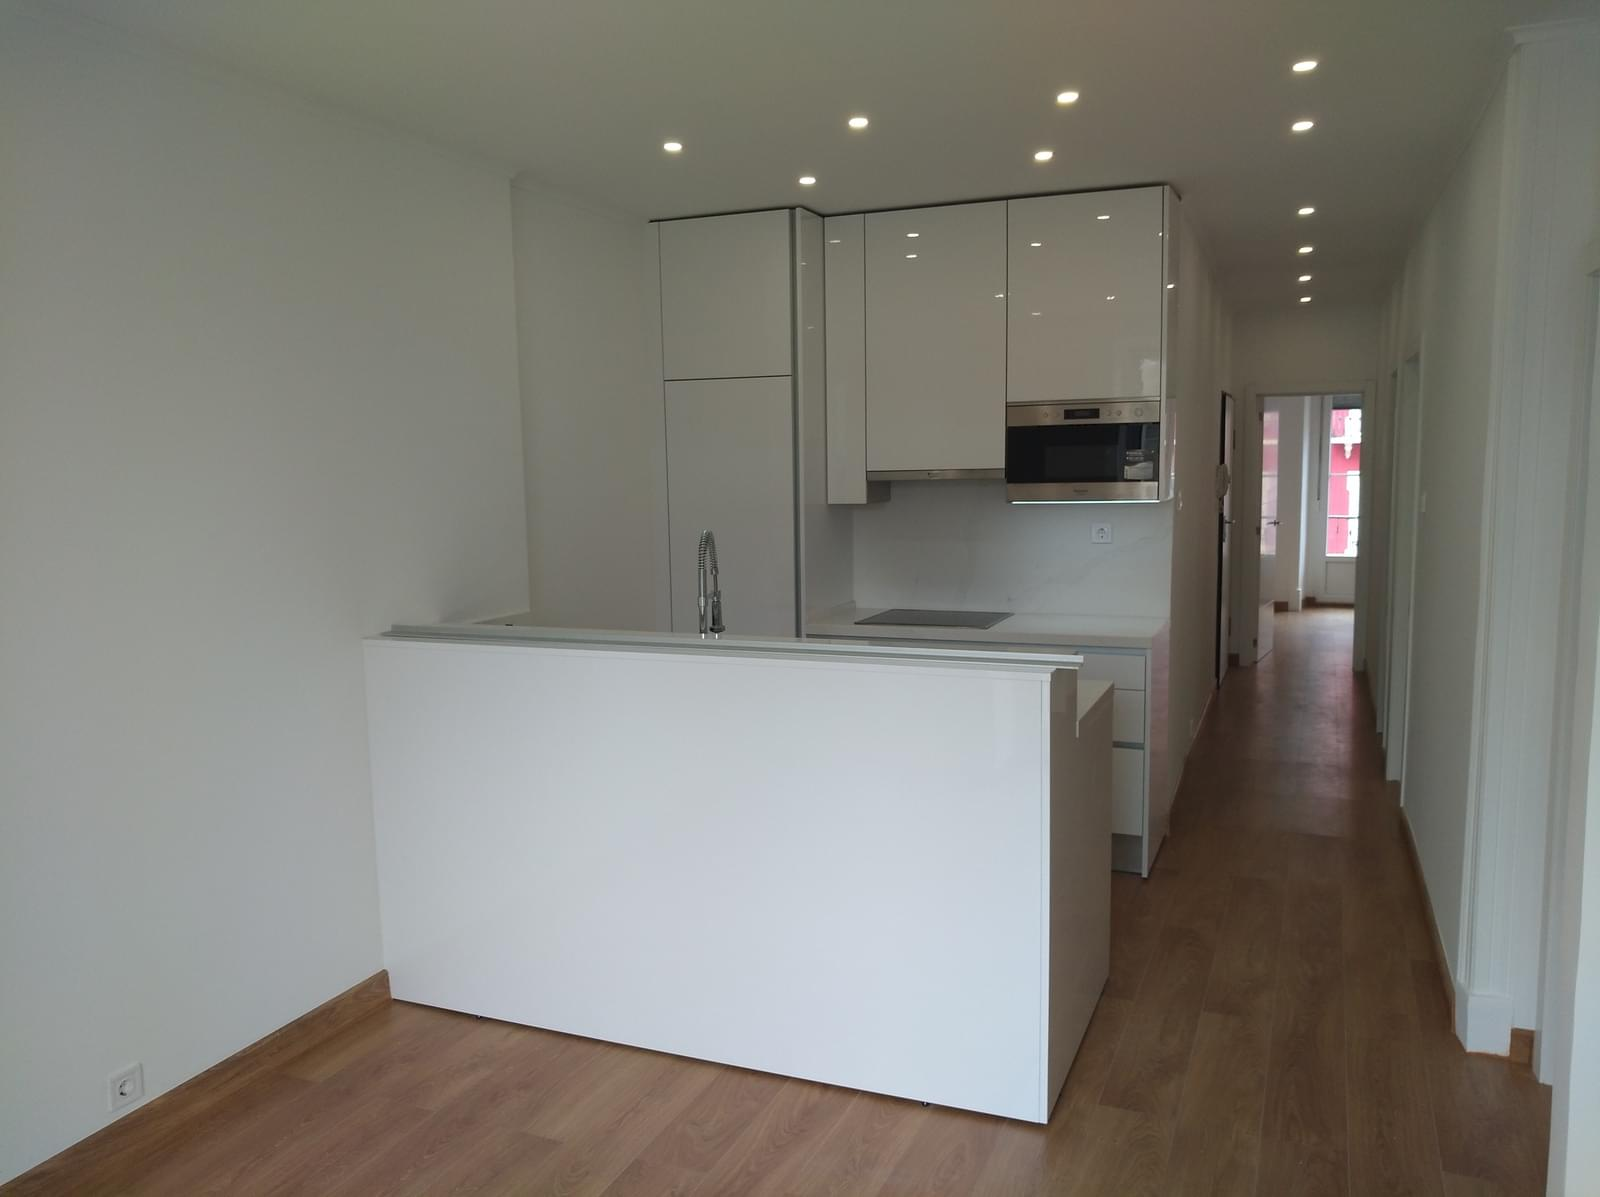 pf17316-apartamento-t2-lisboa-1e0e126d-ba38-466f-8409-120ebf66153c